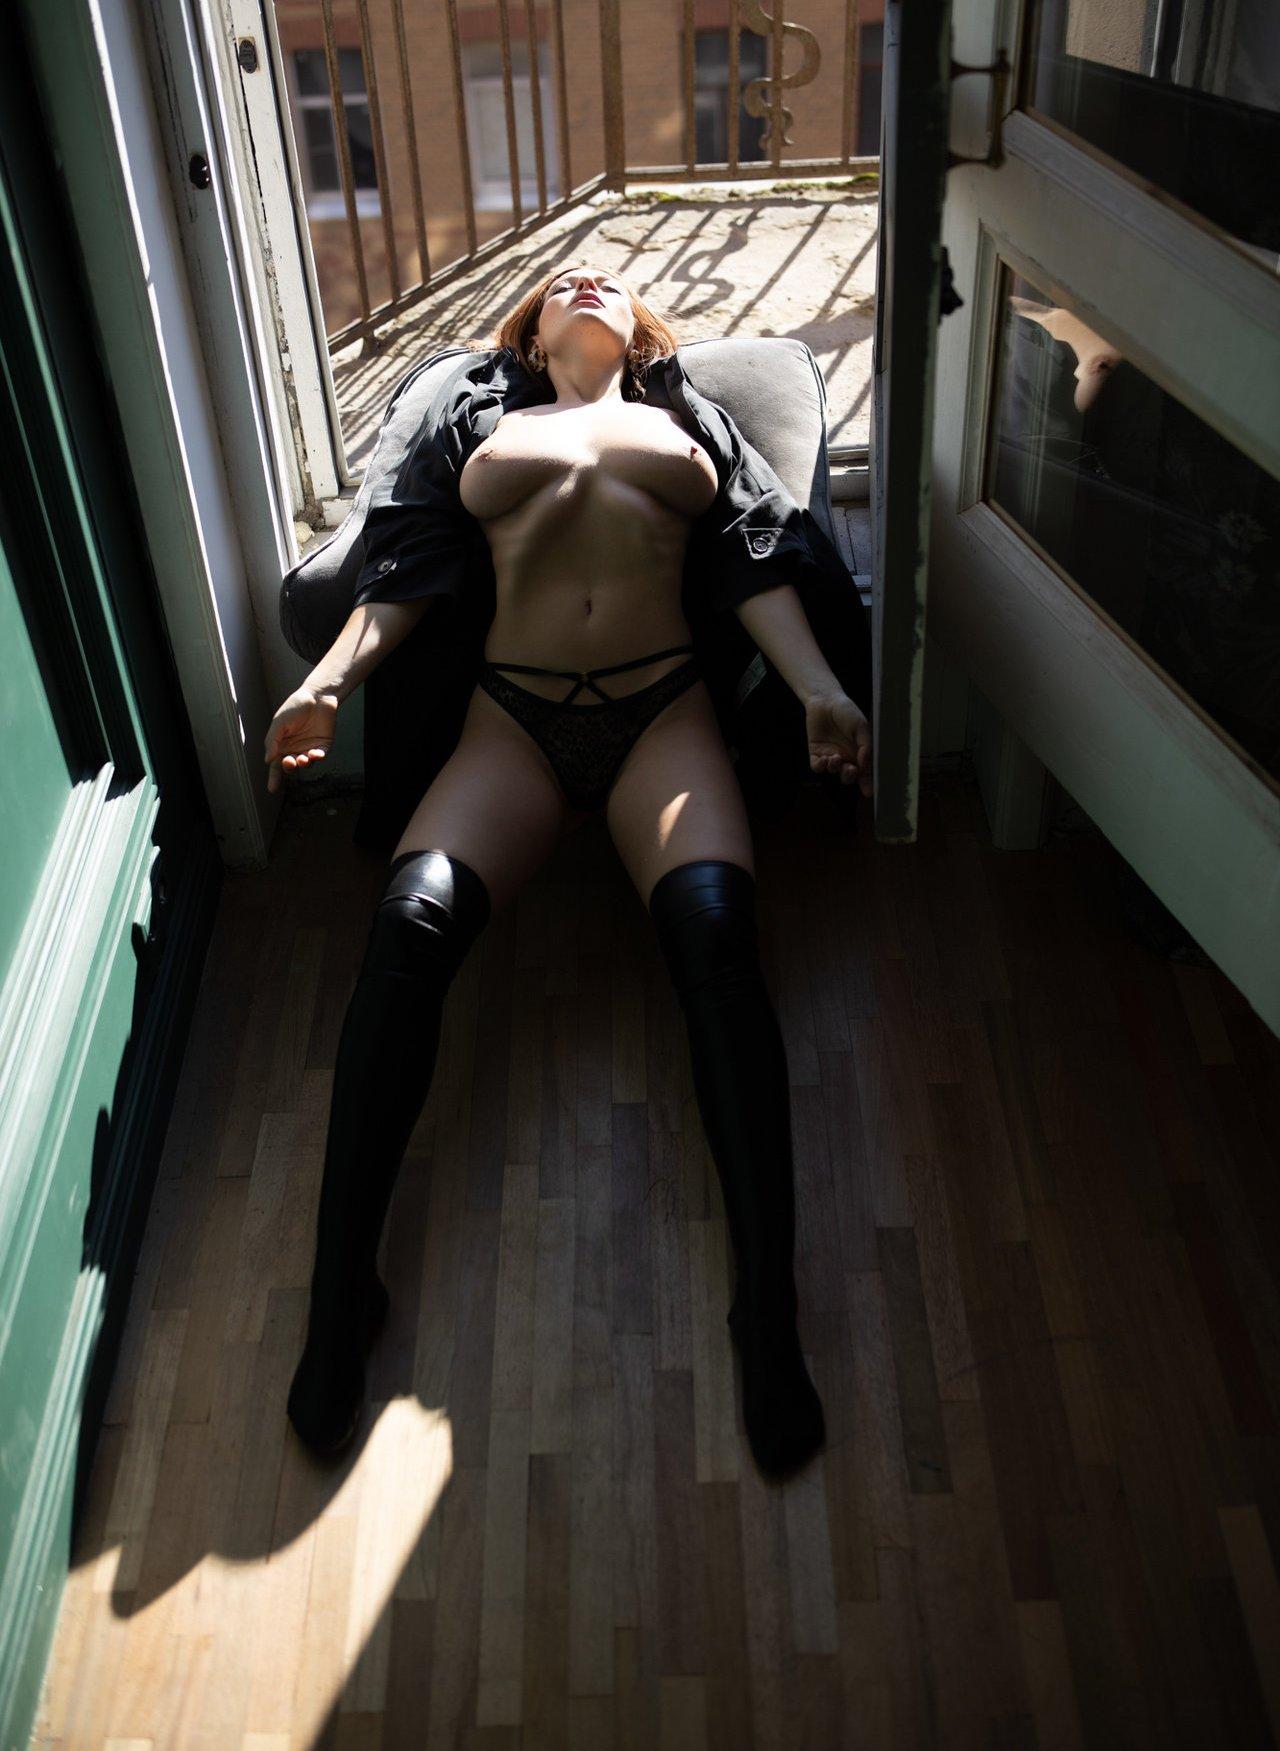 Olga Kobzar Bugs Bunny Gf Nudes Leaks 0012